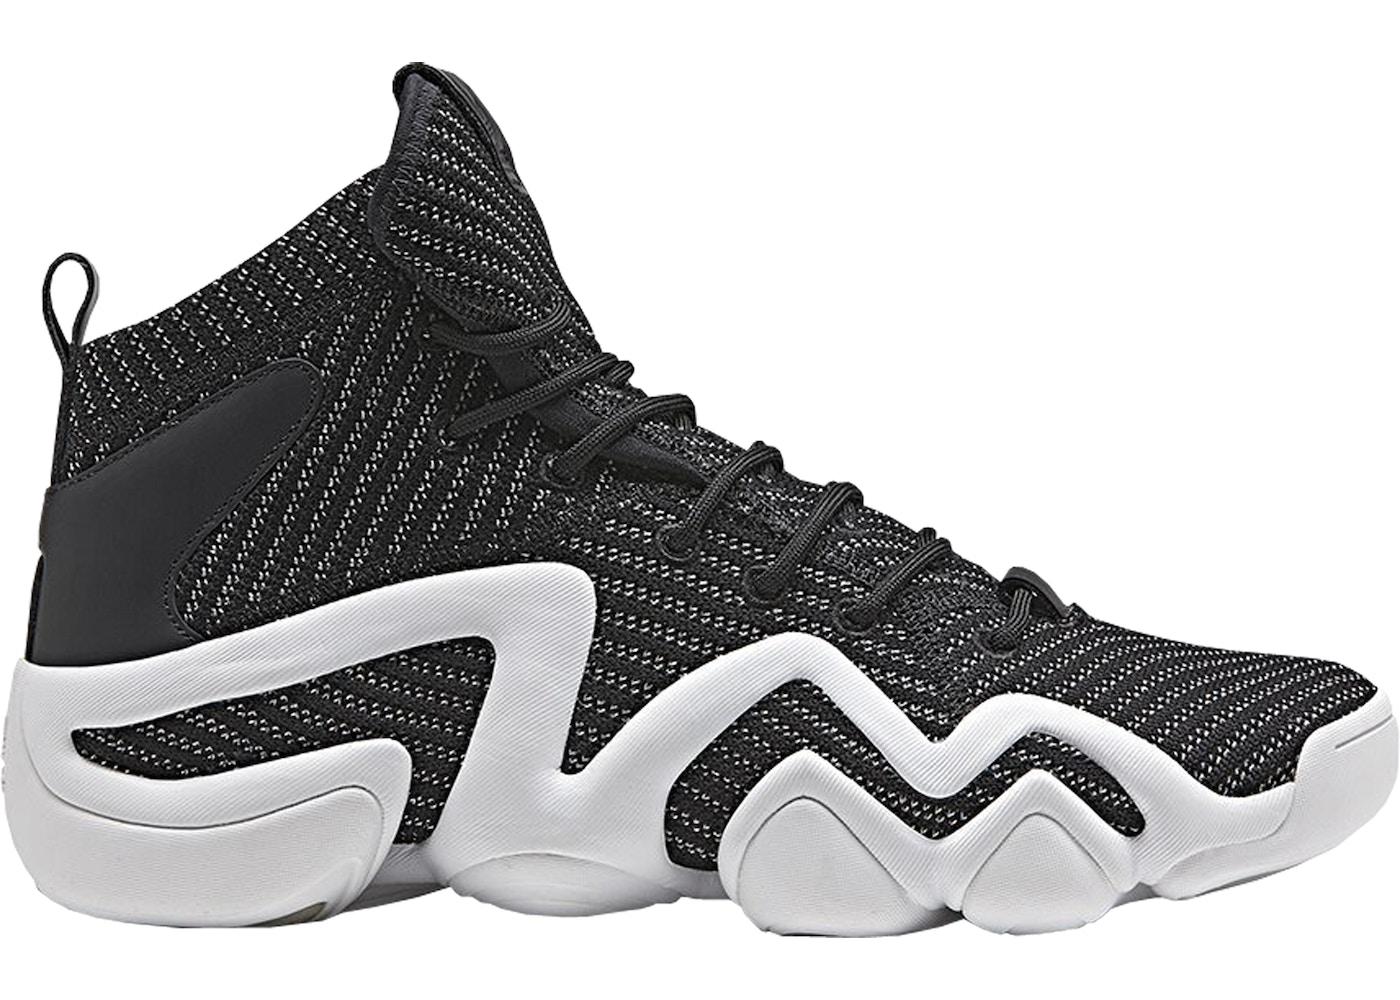 adidas crazy sneakers